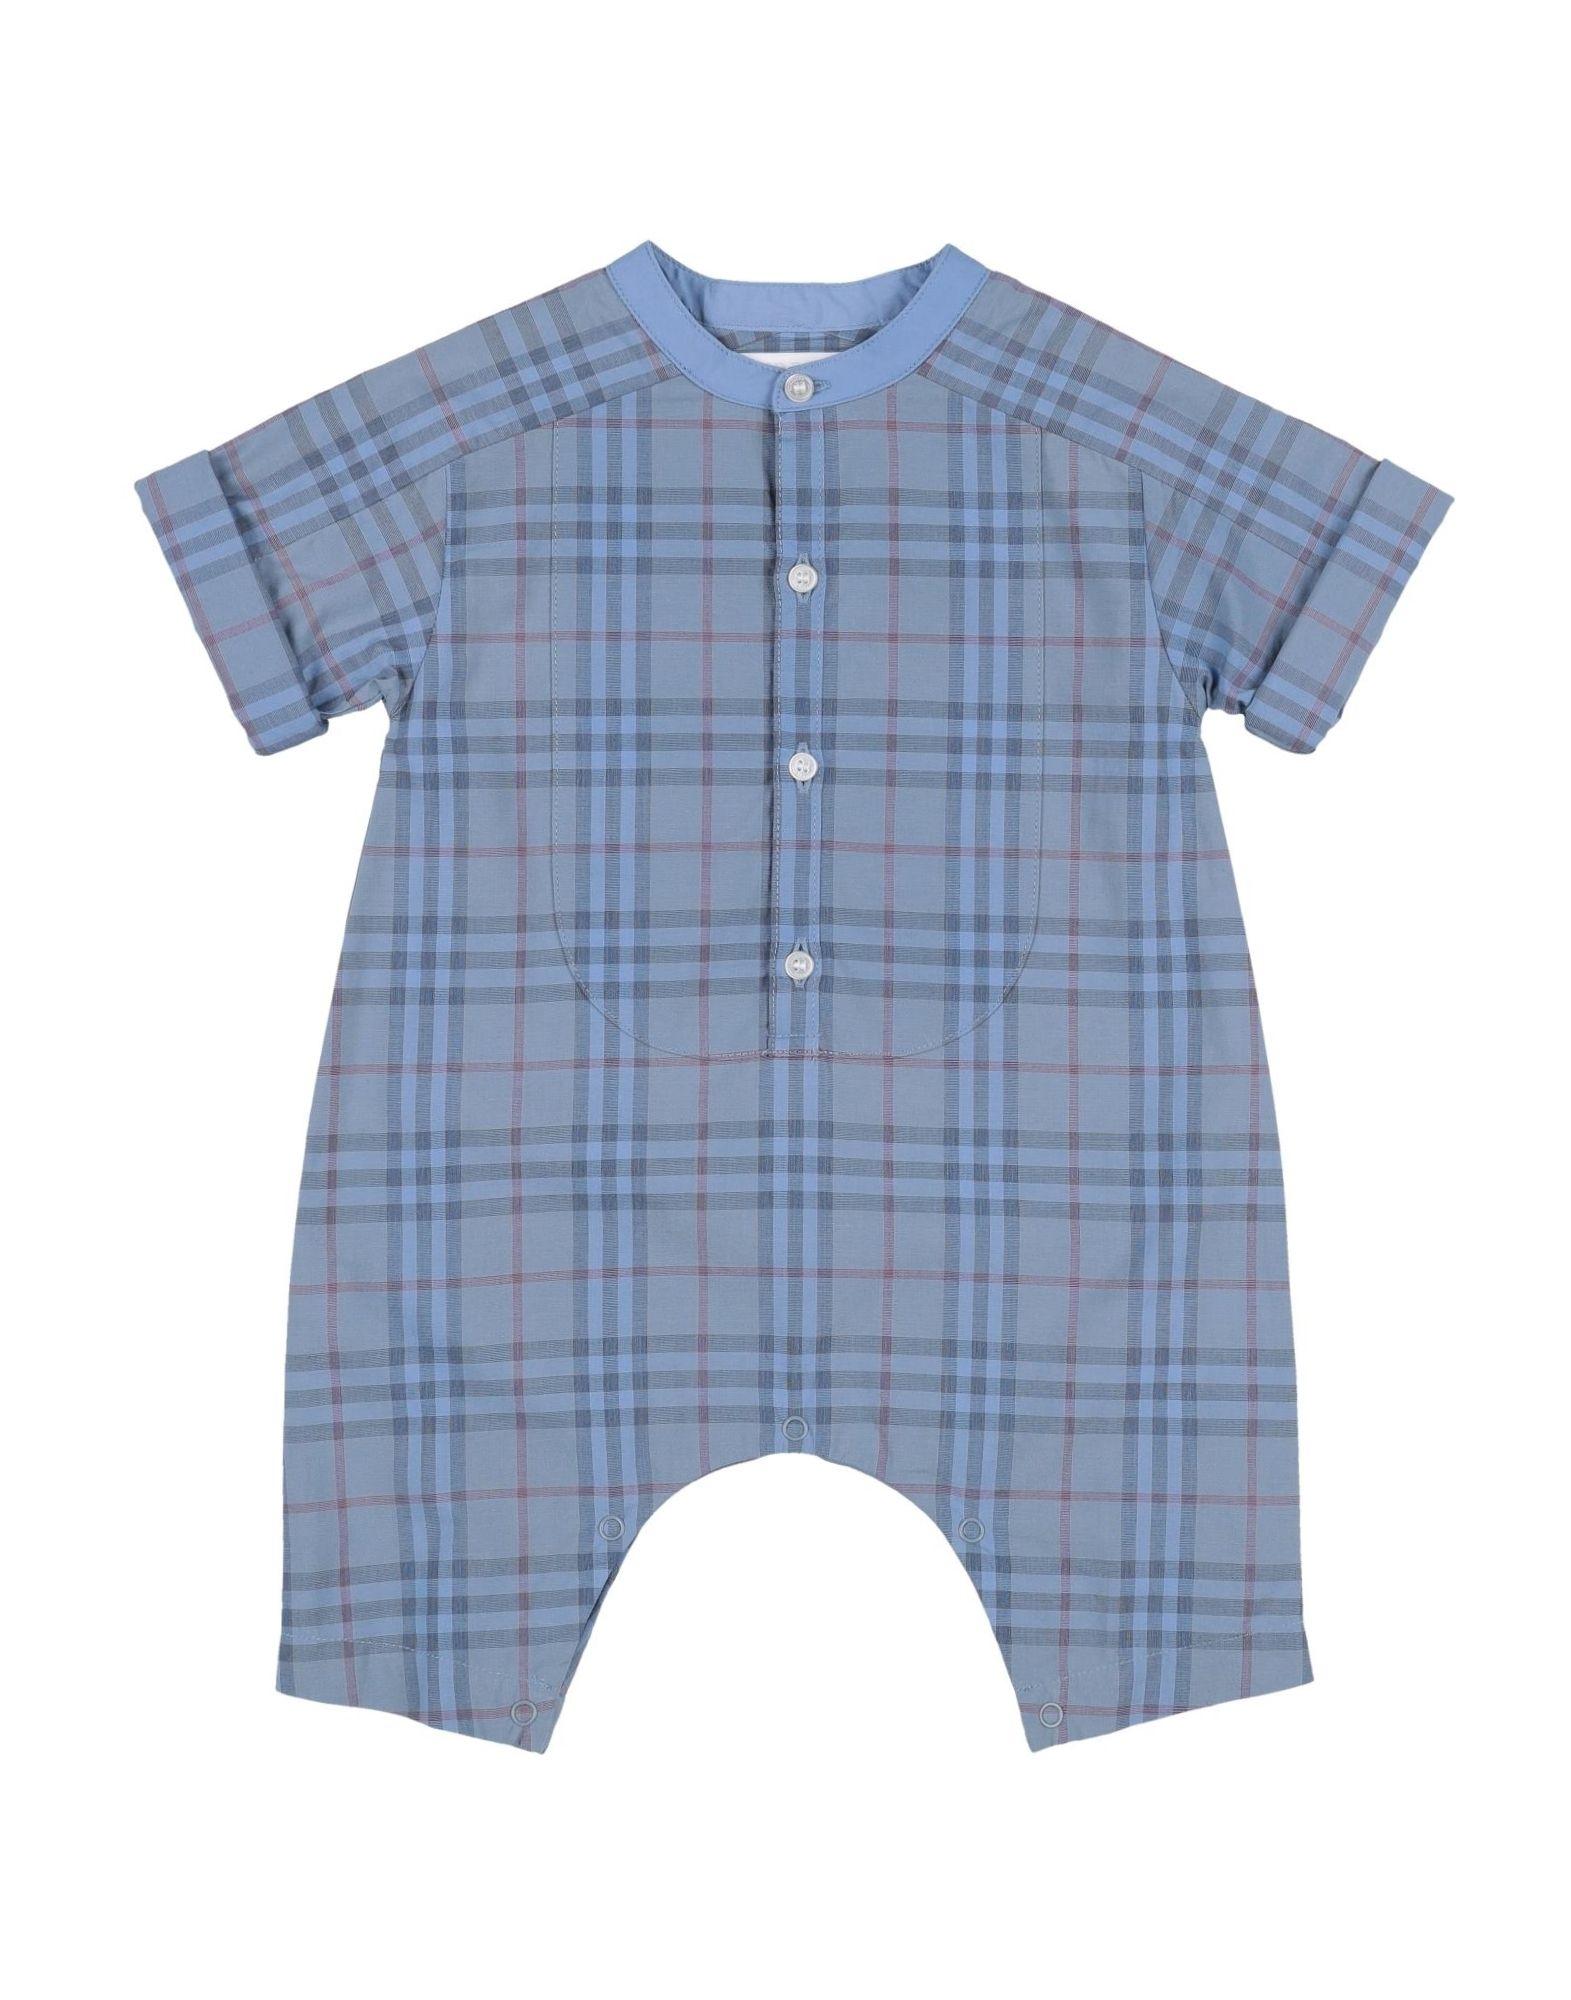 YOOX.COM(ユークス)《セール開催中》BURBERRY ボーイズ 0-24 ヶ月 乳幼児用ロンパース アジュールブルー 12 コットン 100%